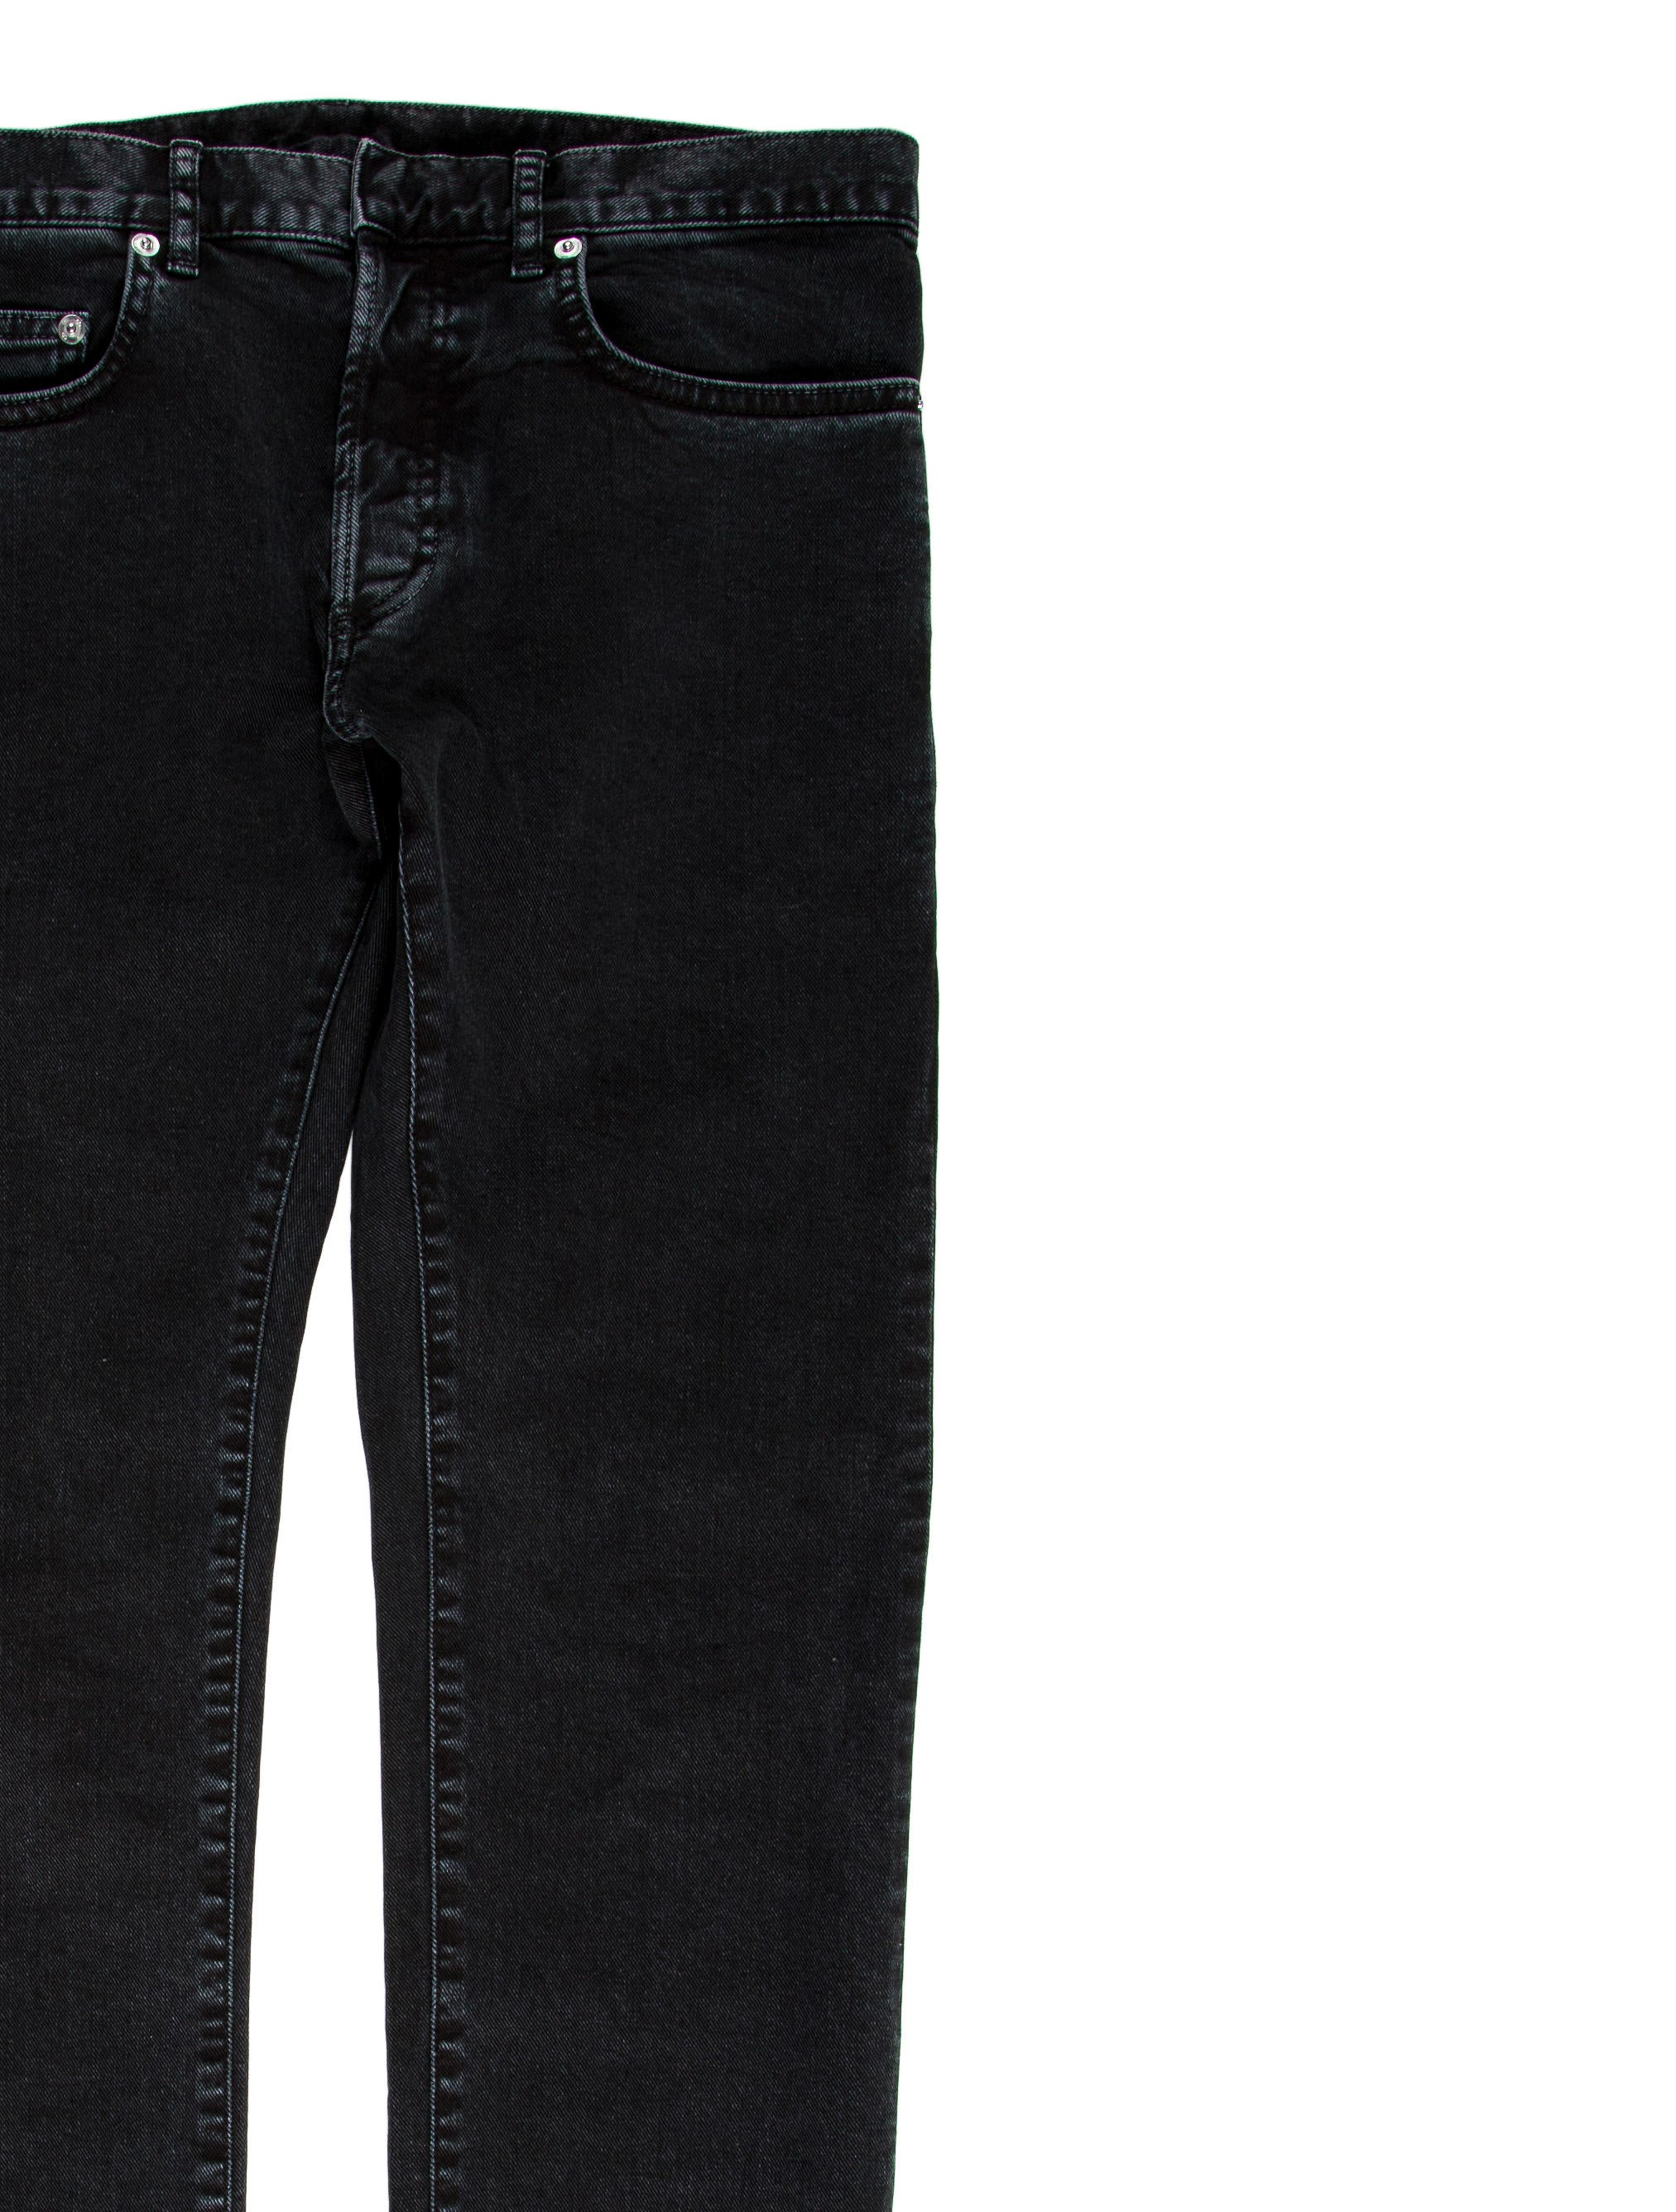 dior homme five pocket skinny jeans w tags clothing. Black Bedroom Furniture Sets. Home Design Ideas